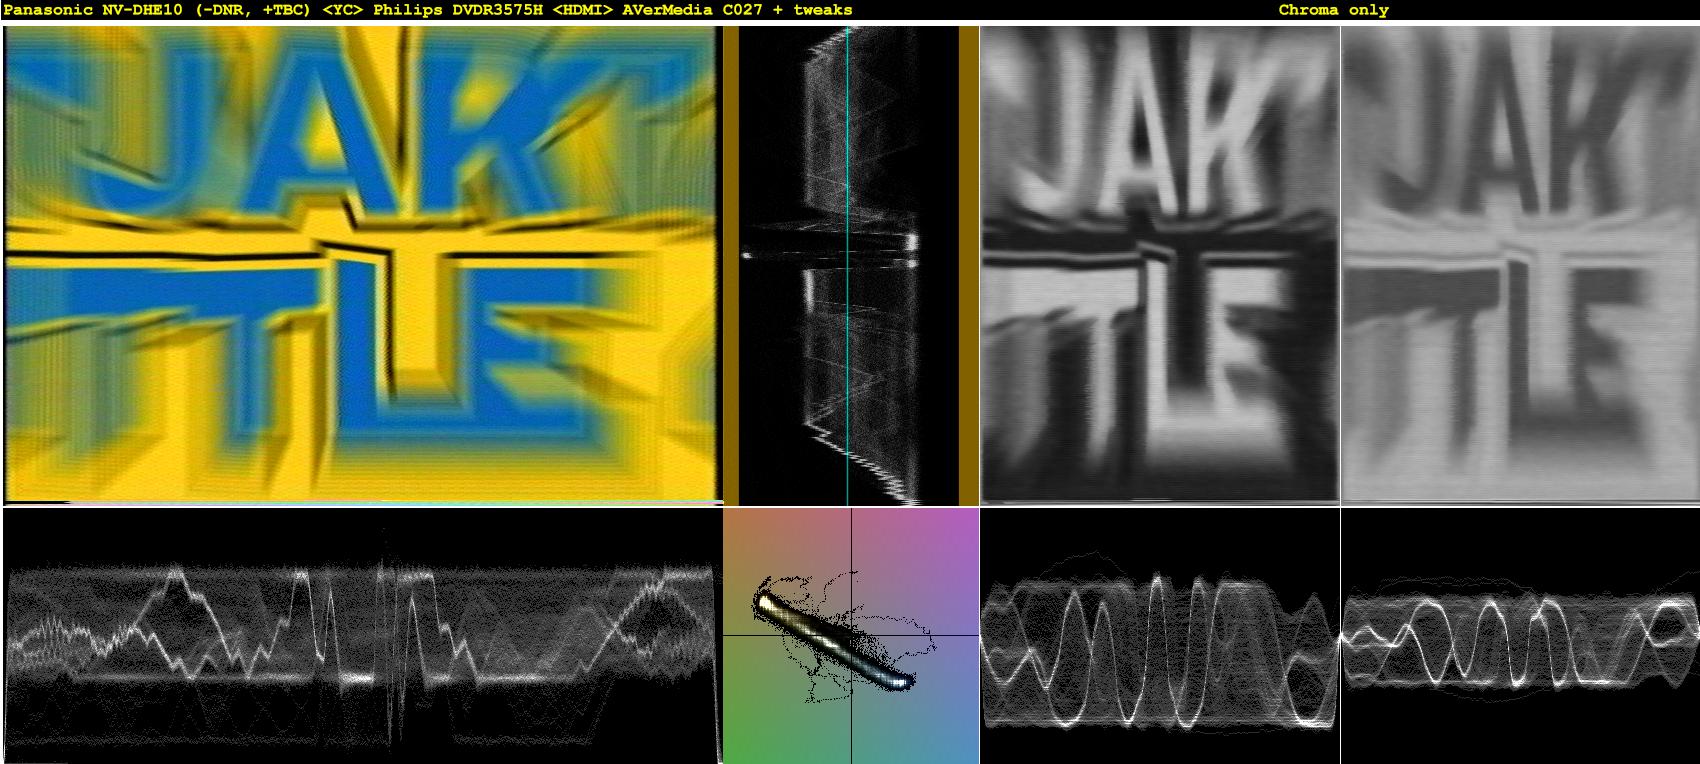 Click image for larger version  Name:0-05-05 - Panasonic NV-DHE10 (-DNR, +TBC).png Views:958 Size:1.15 MB ID:38007